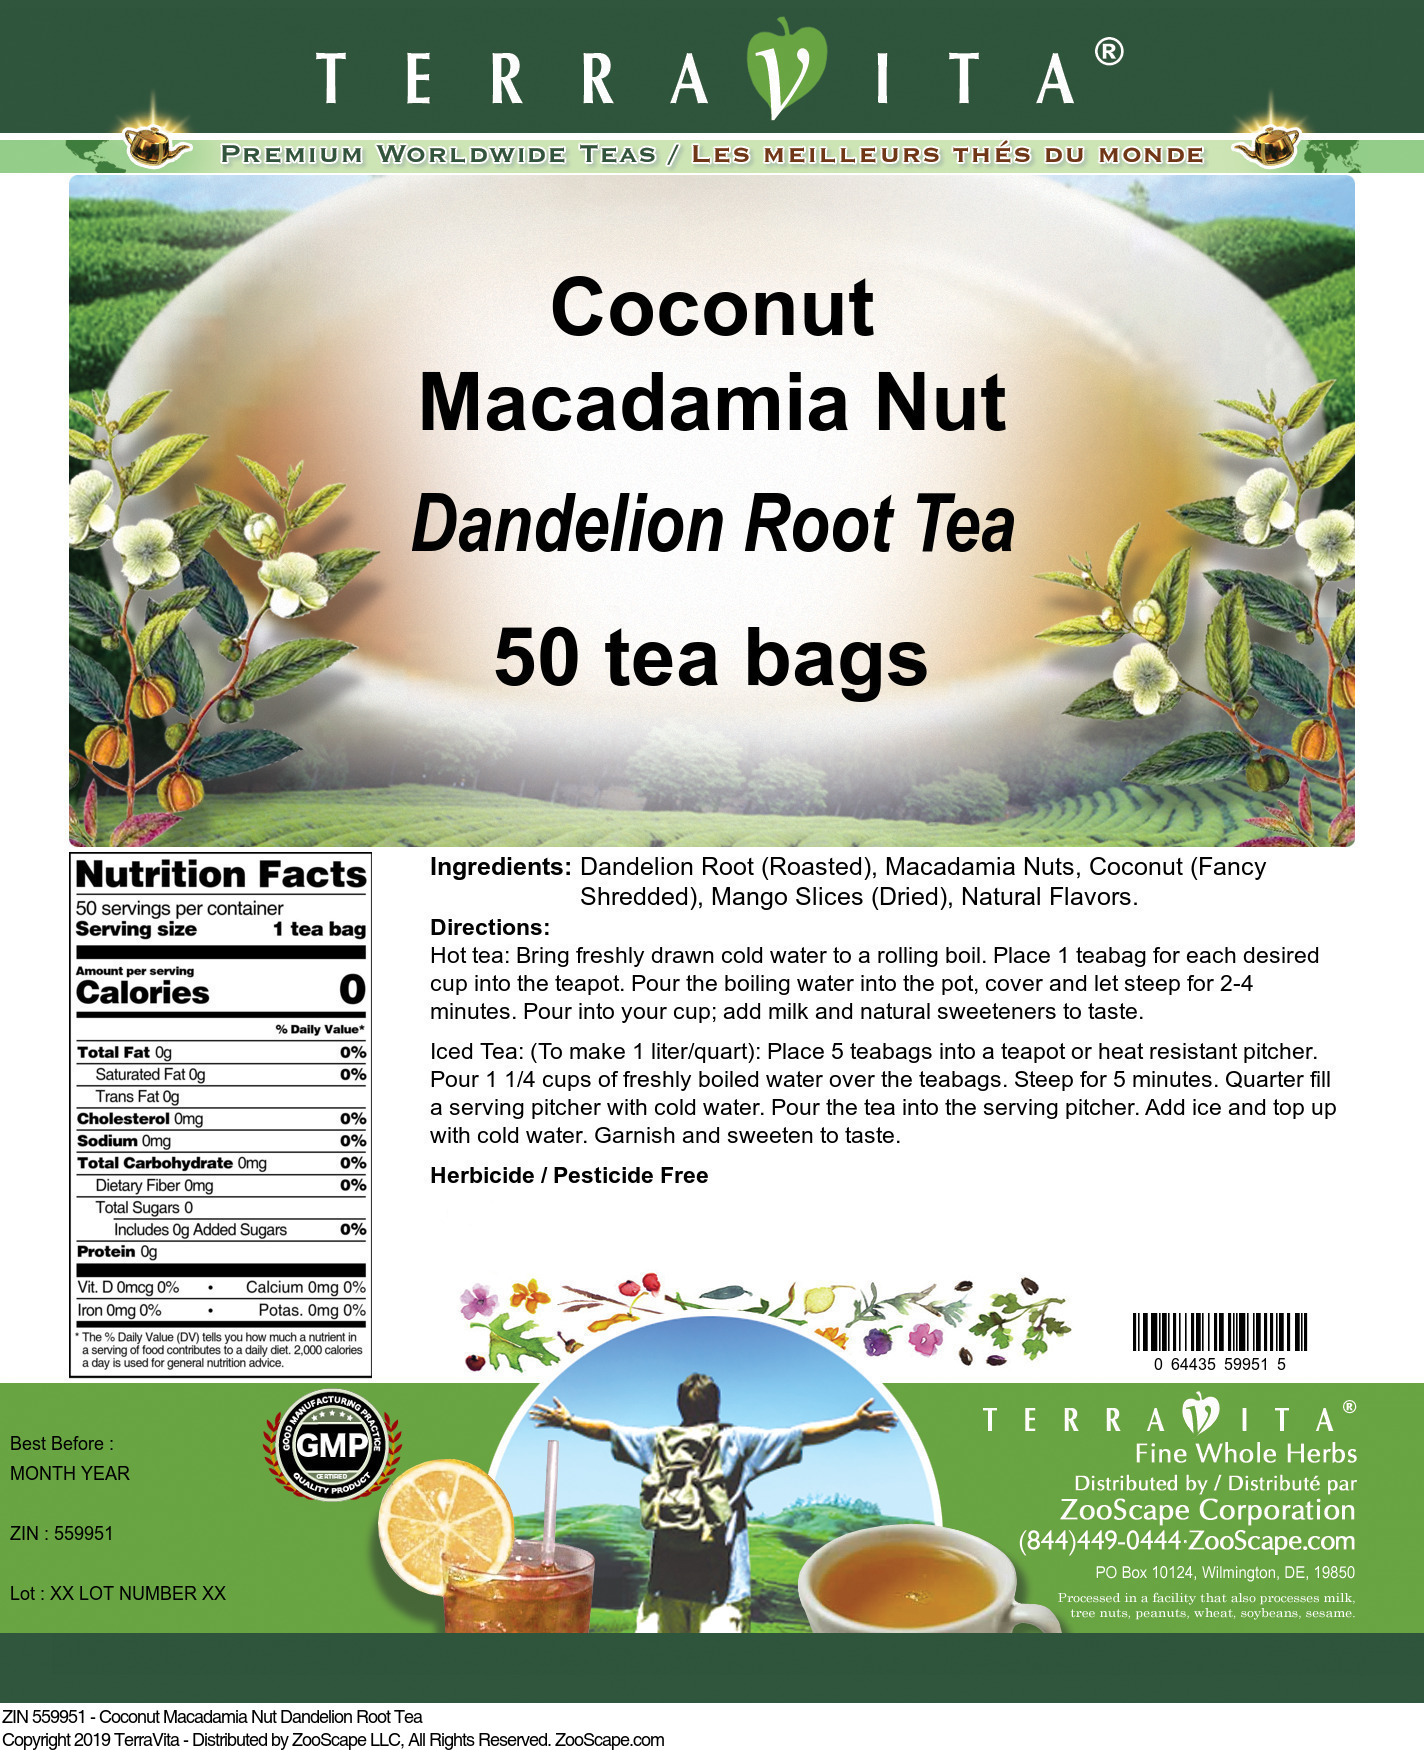 Coconut Macadamia Nut Dandelion Root Tea